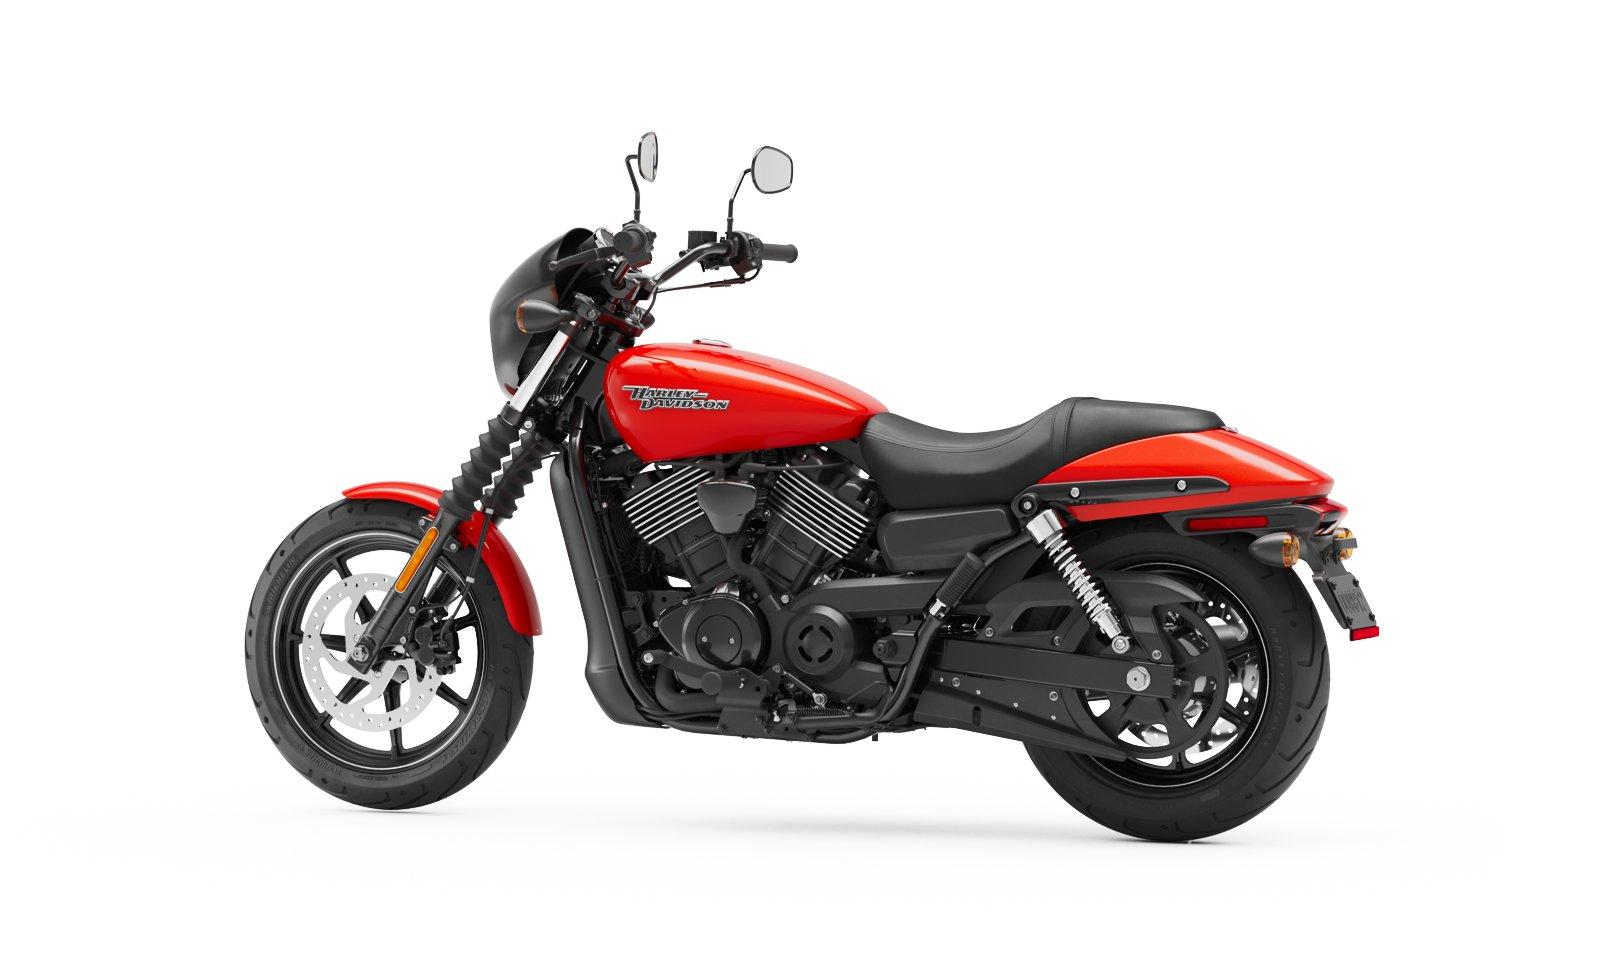 2020 Harley Davidson Street 750 Motorcycle Harley Davidson Usa